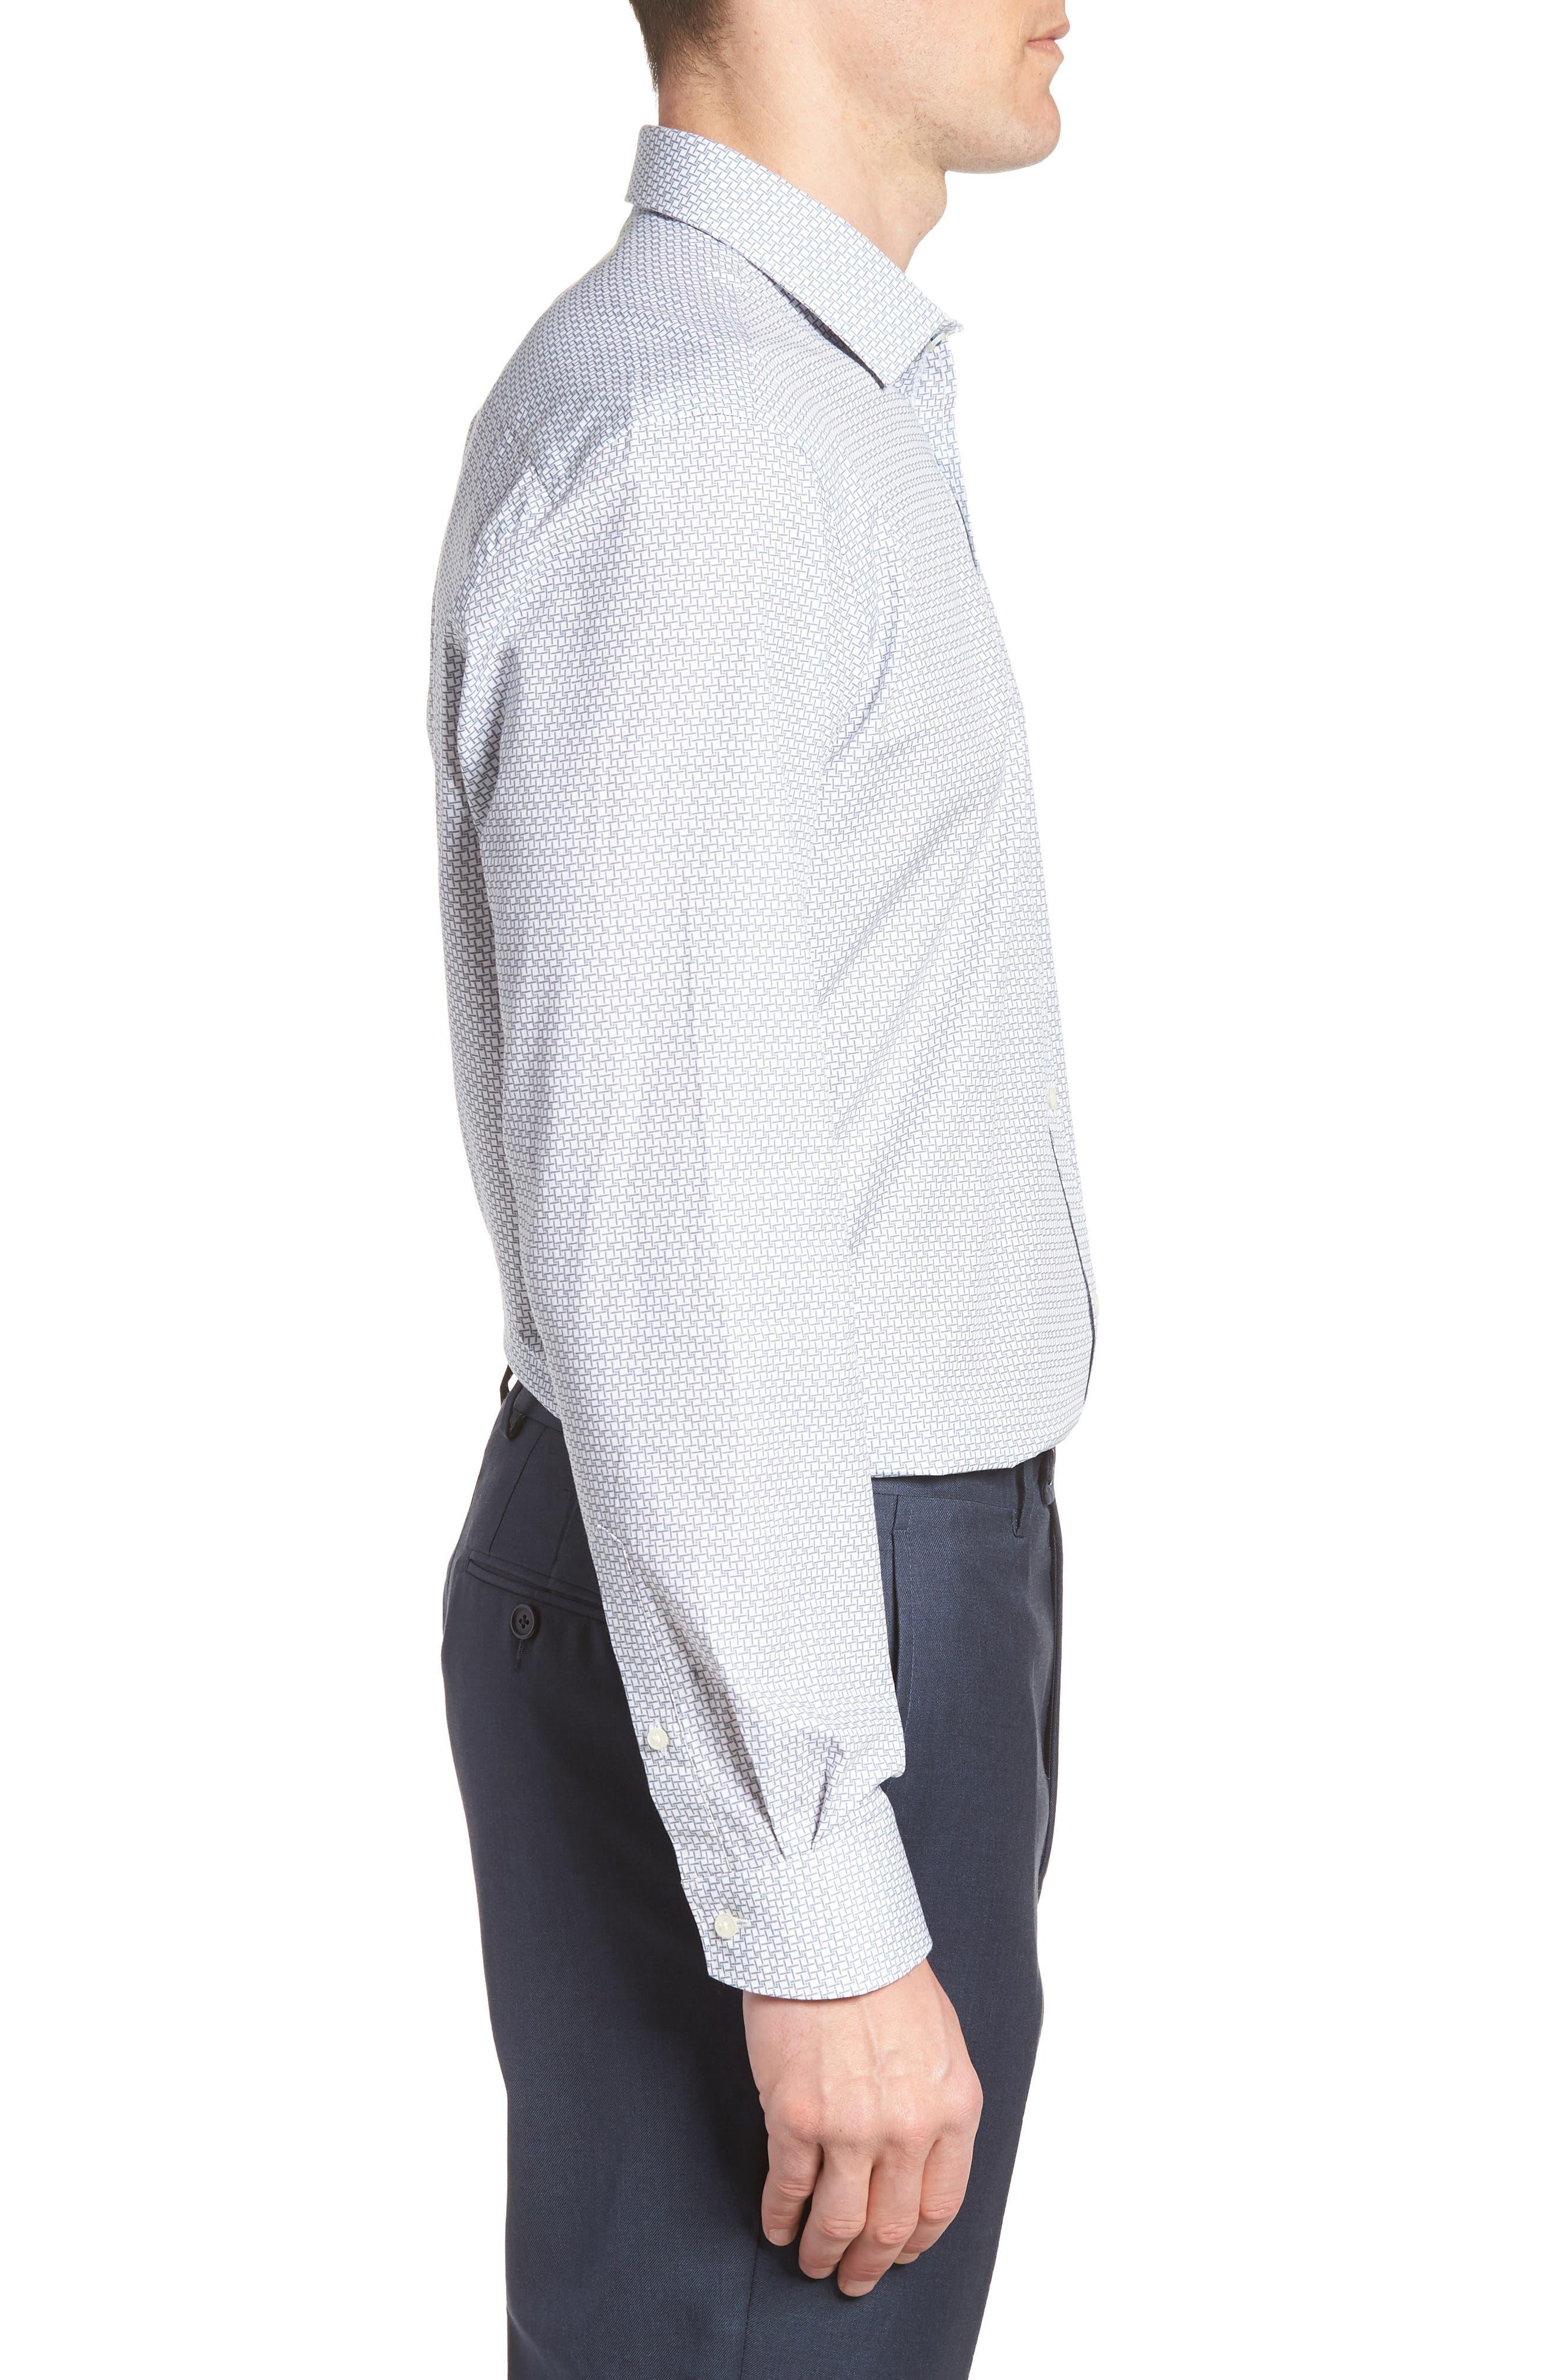 Rosprim Trim Fit Geometric Dress Shirt,                             Alternate thumbnail 4, color,                             GREY